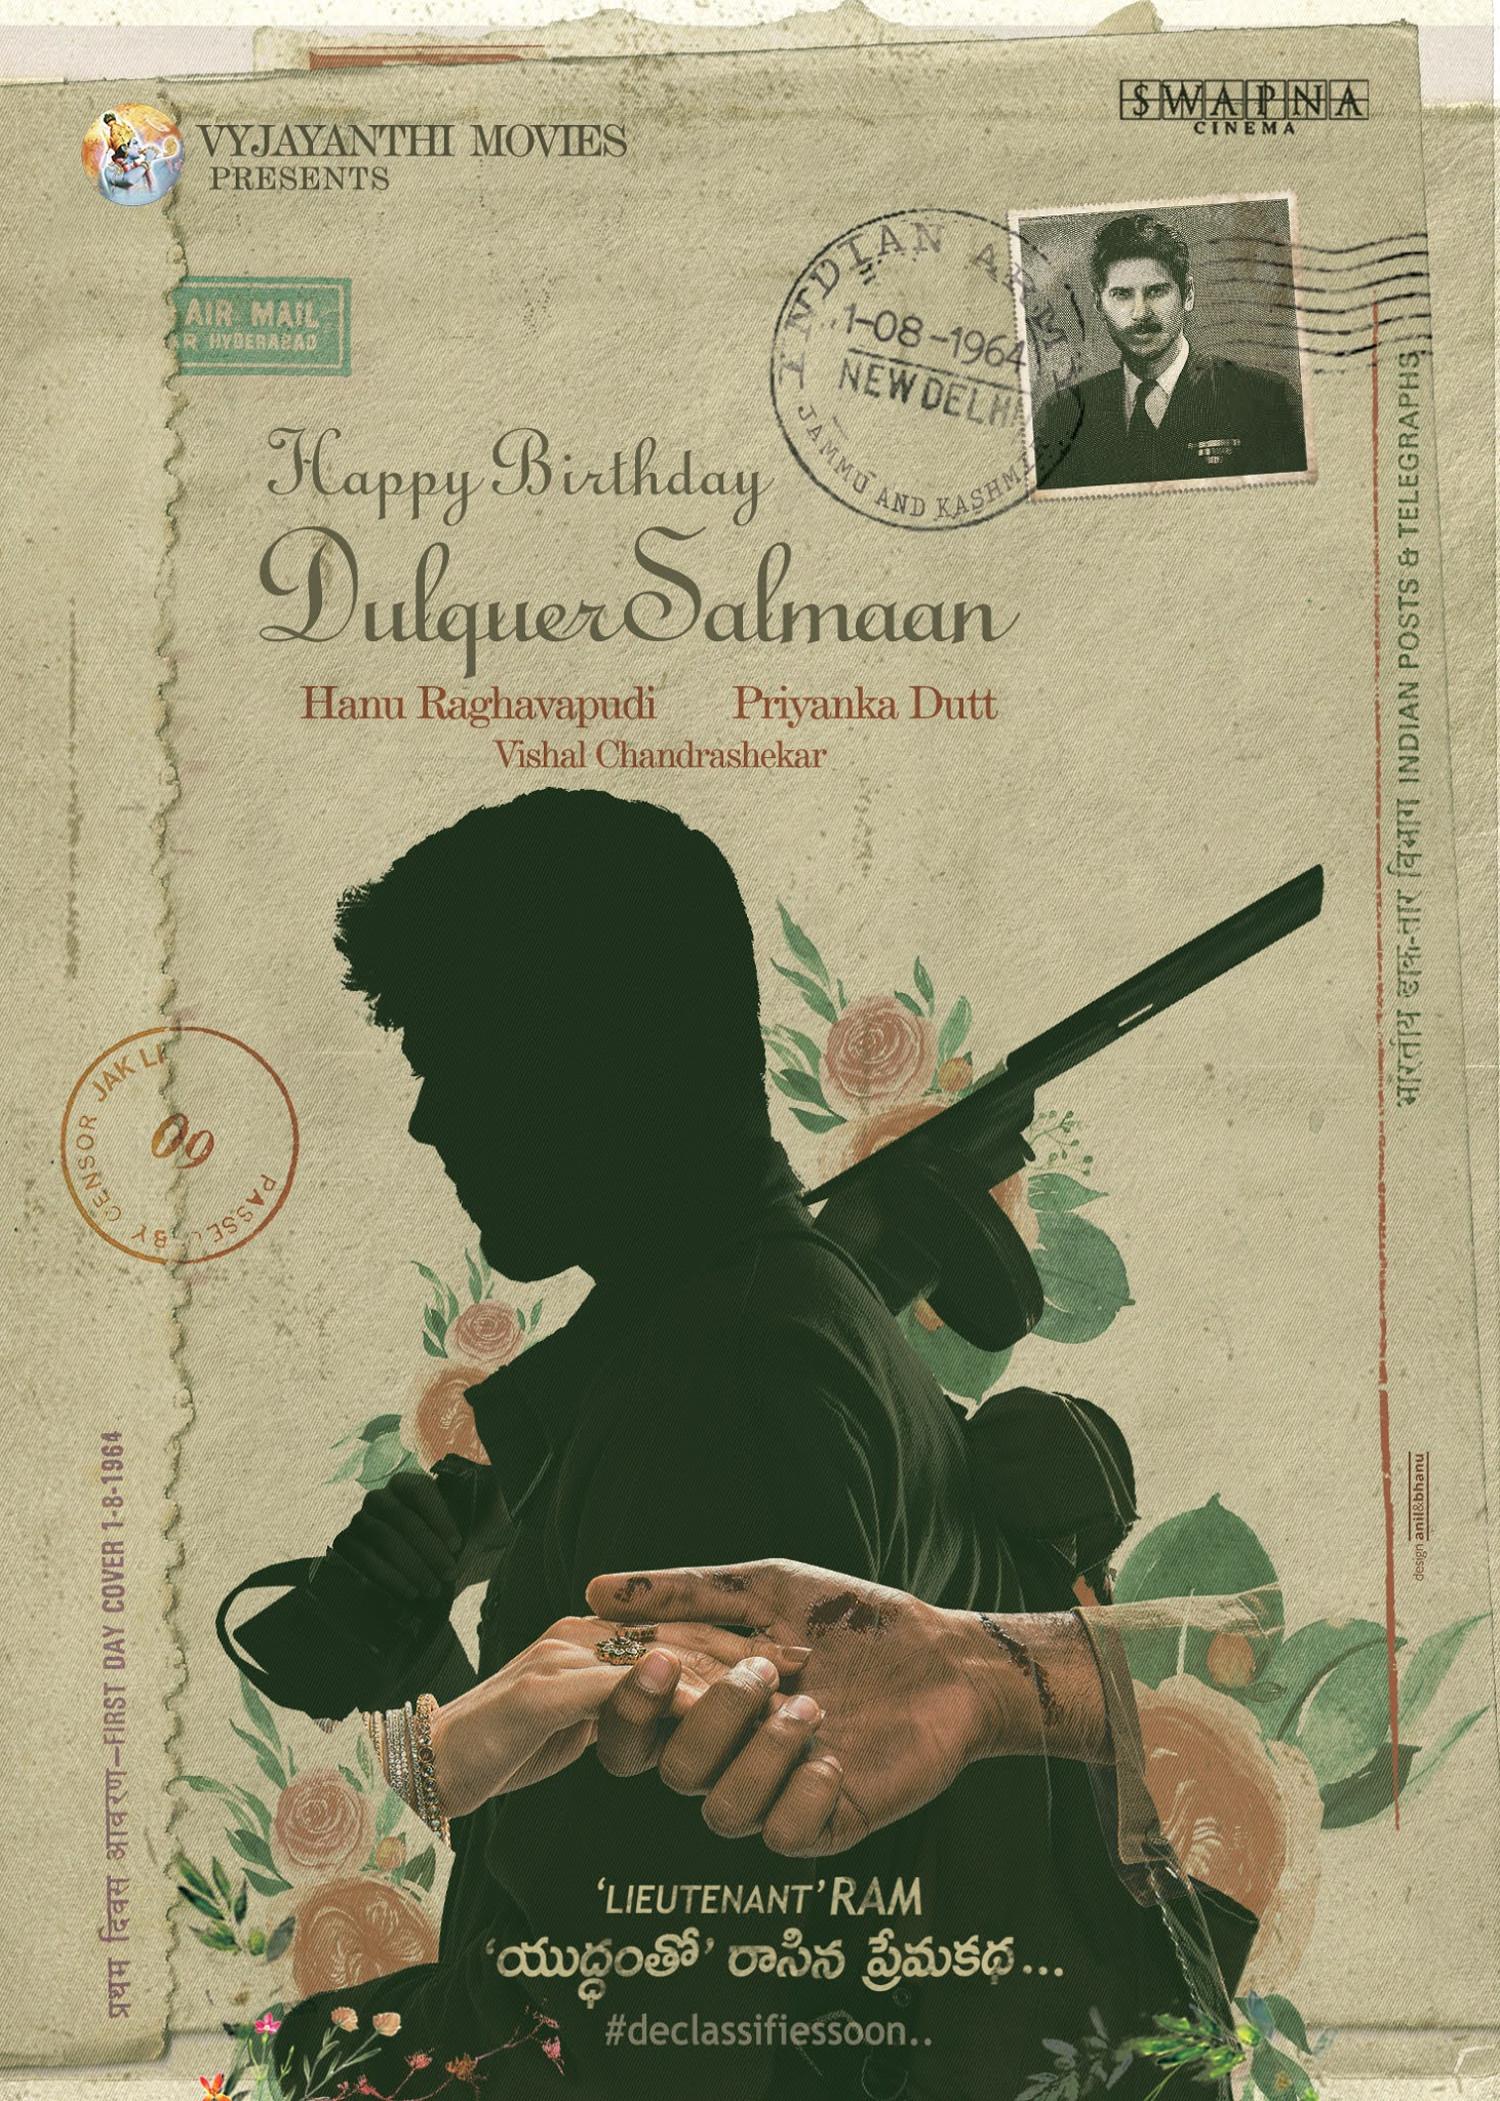 Actor Dulquer Salmaan as Lieutenant Ram @ 1964 Period Love Story During War Movie Poster